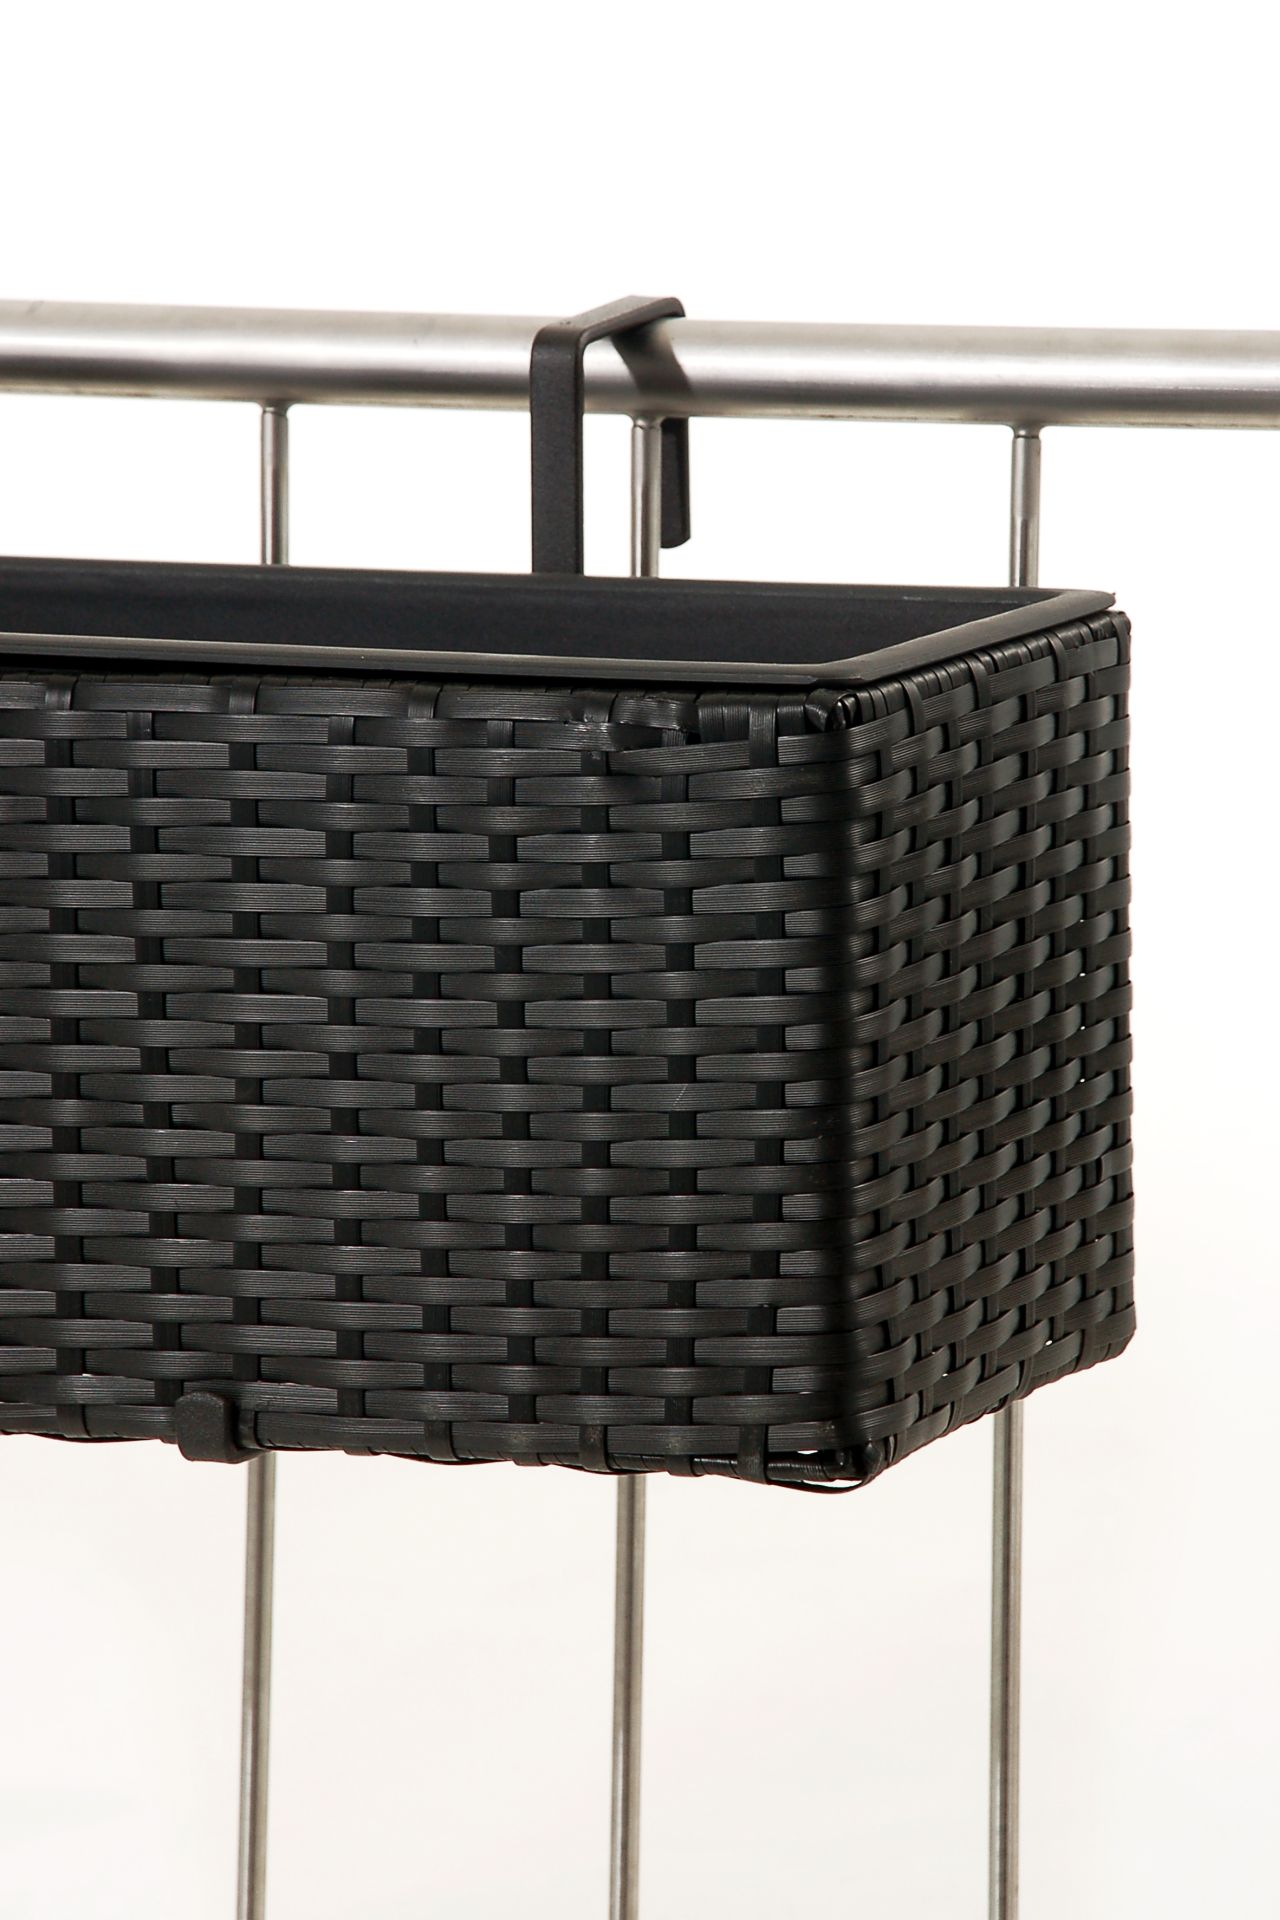 blumenkasten balkonkasten balkoni polyrattan 80 cm. Black Bedroom Furniture Sets. Home Design Ideas